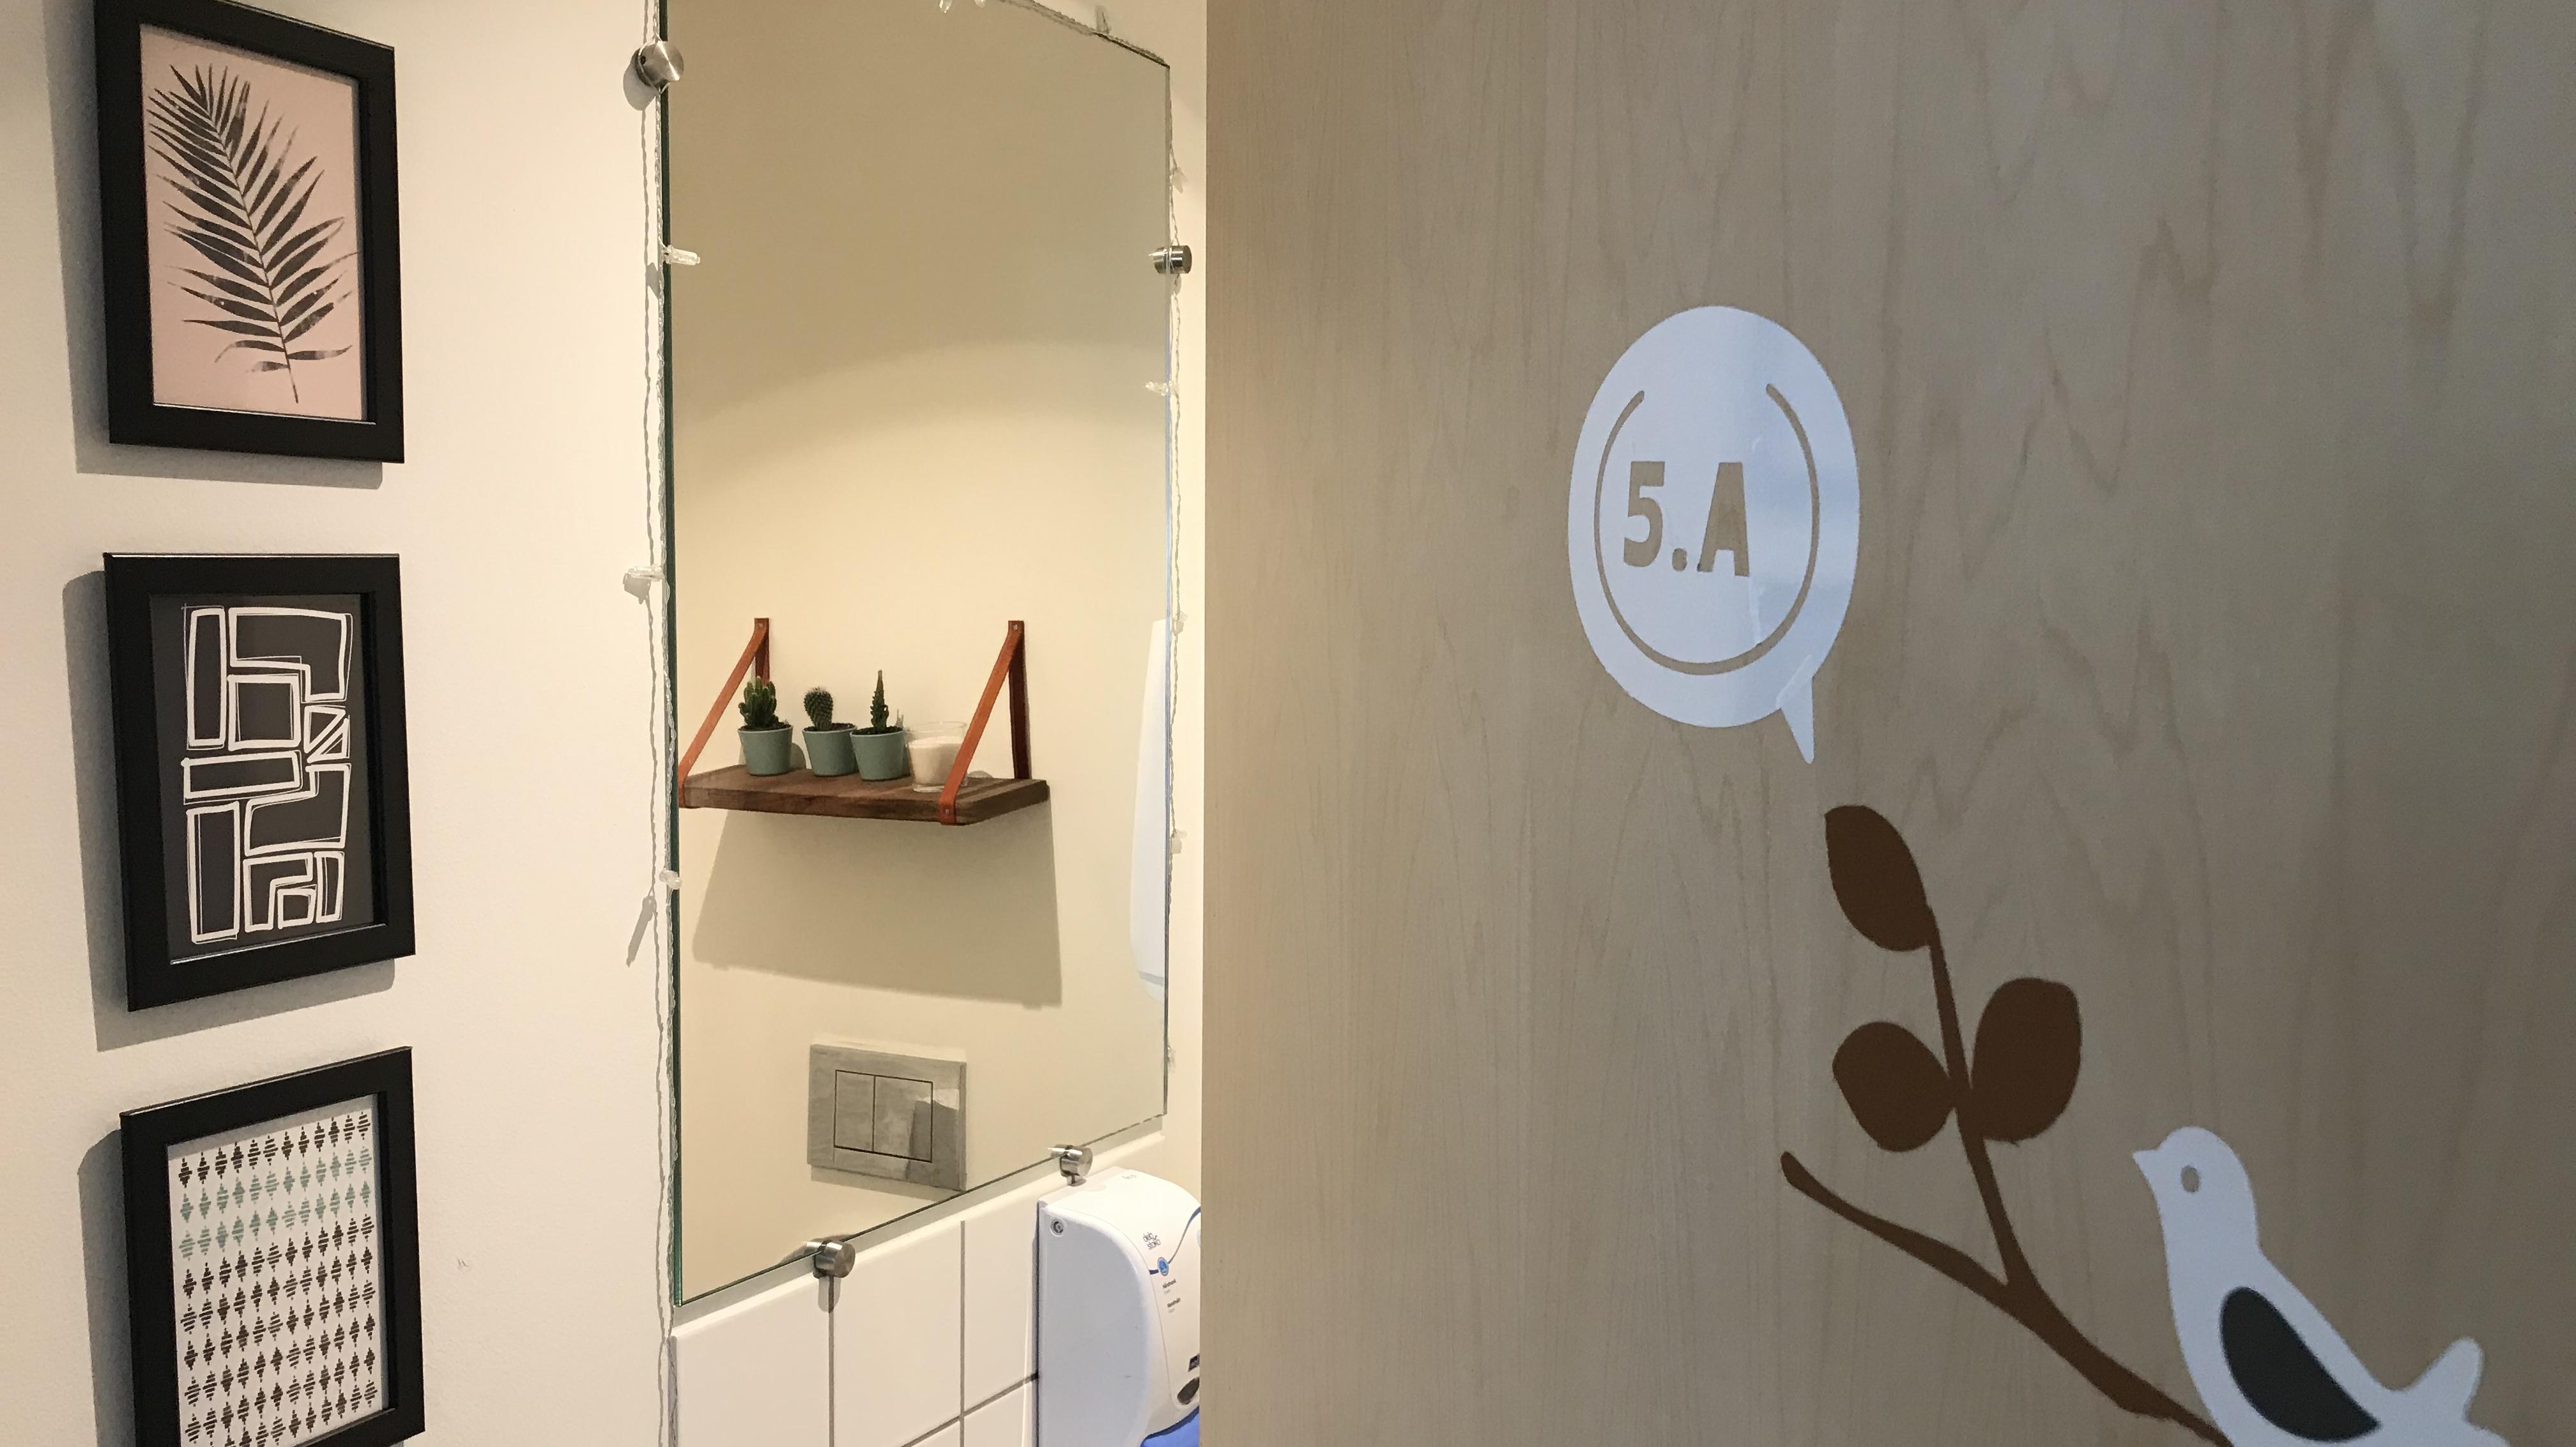 5.a toilet spurvelundskolen.jpg